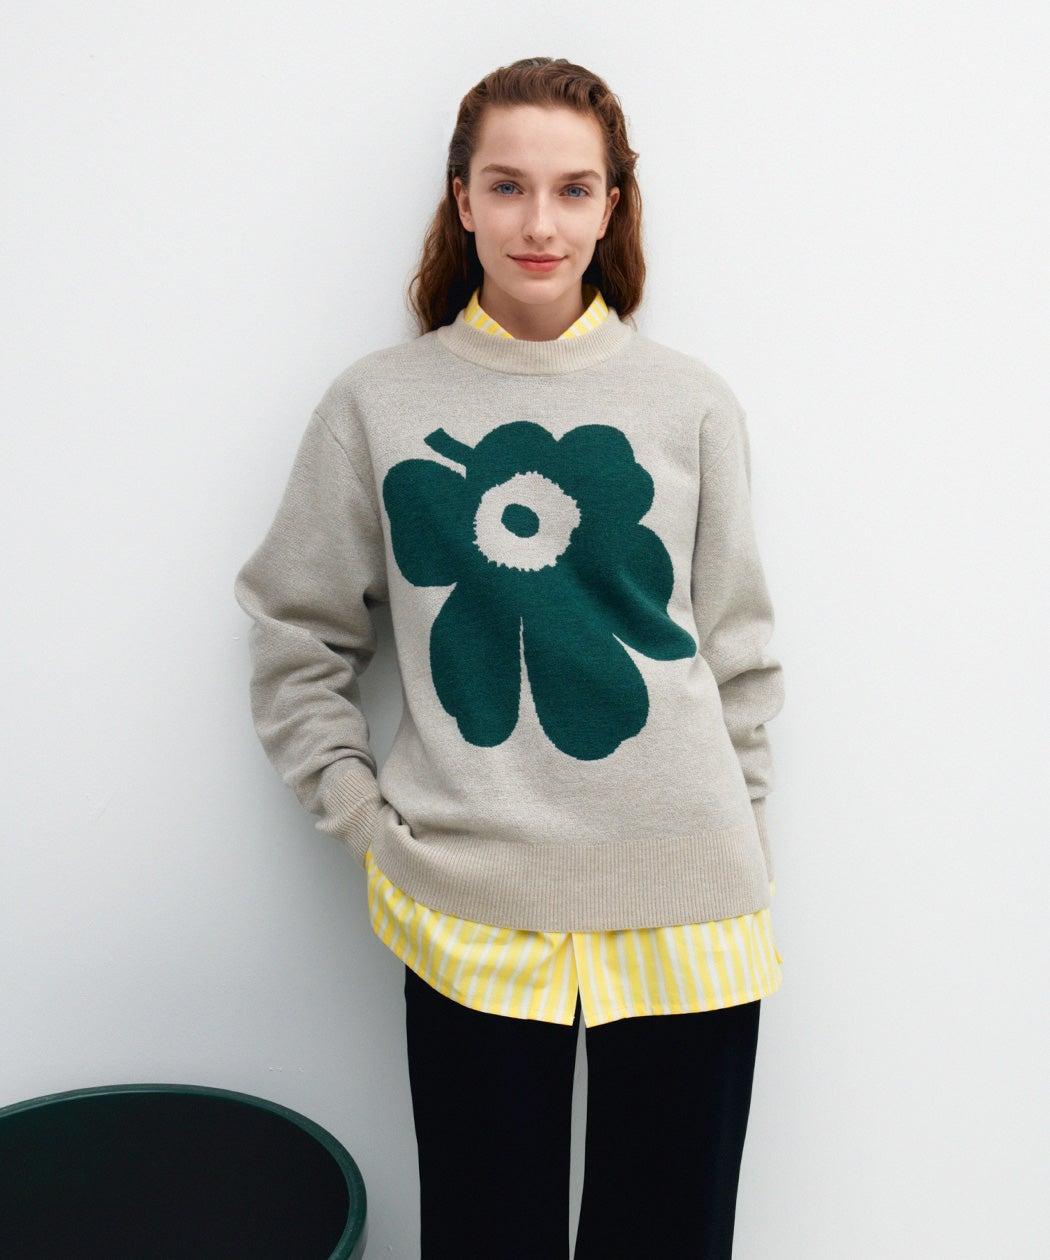 Marimekko Unikko knit